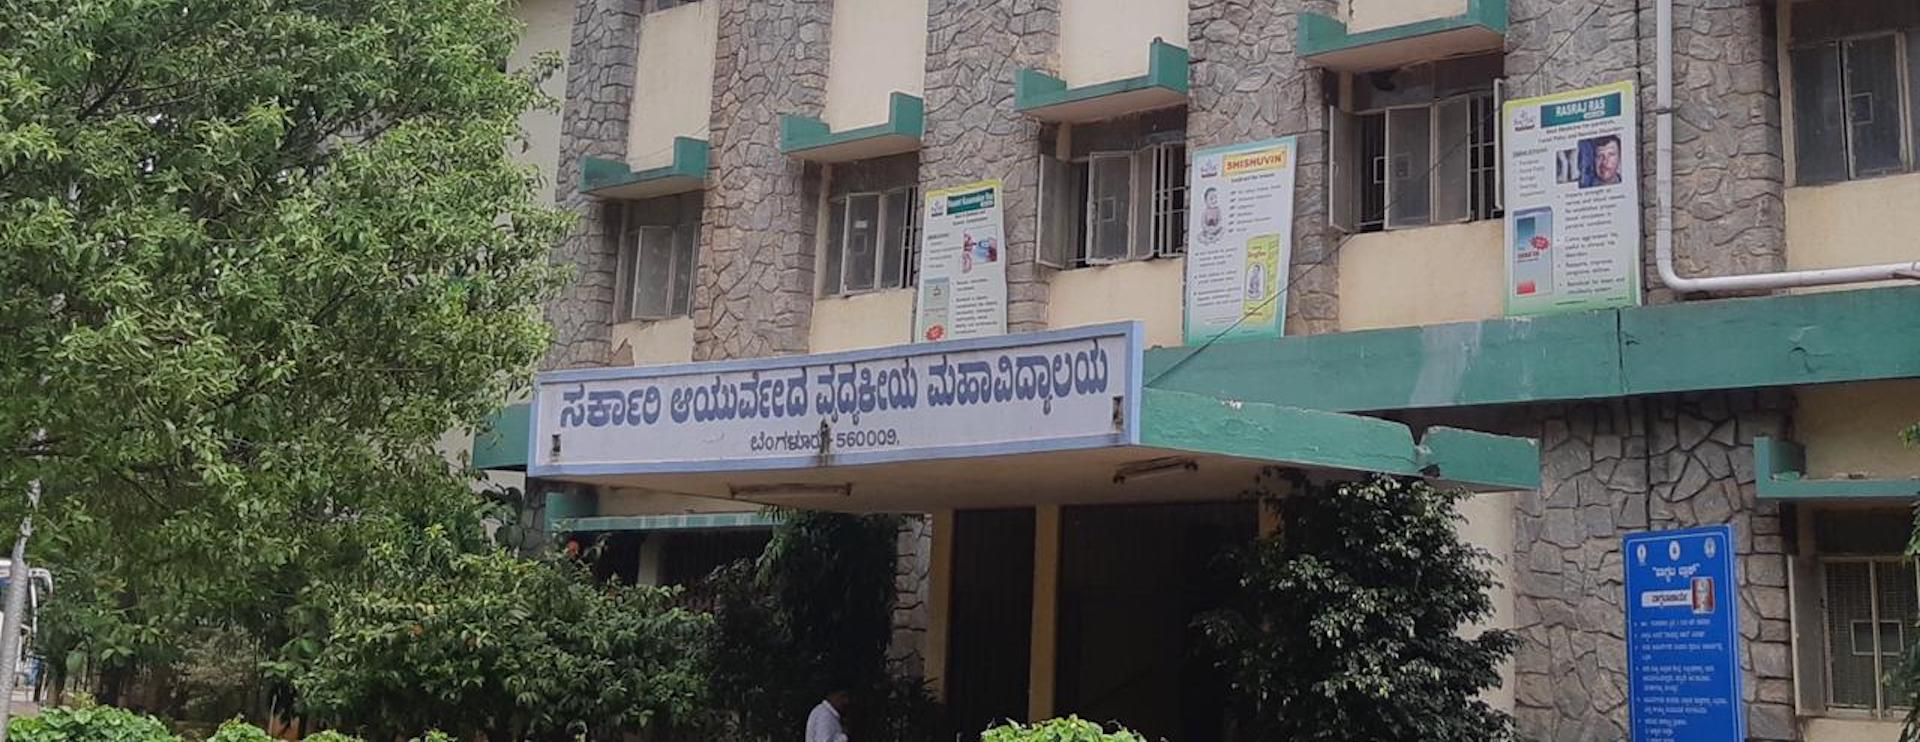 Government Ayurvedic Medical College, Bengaluru Image